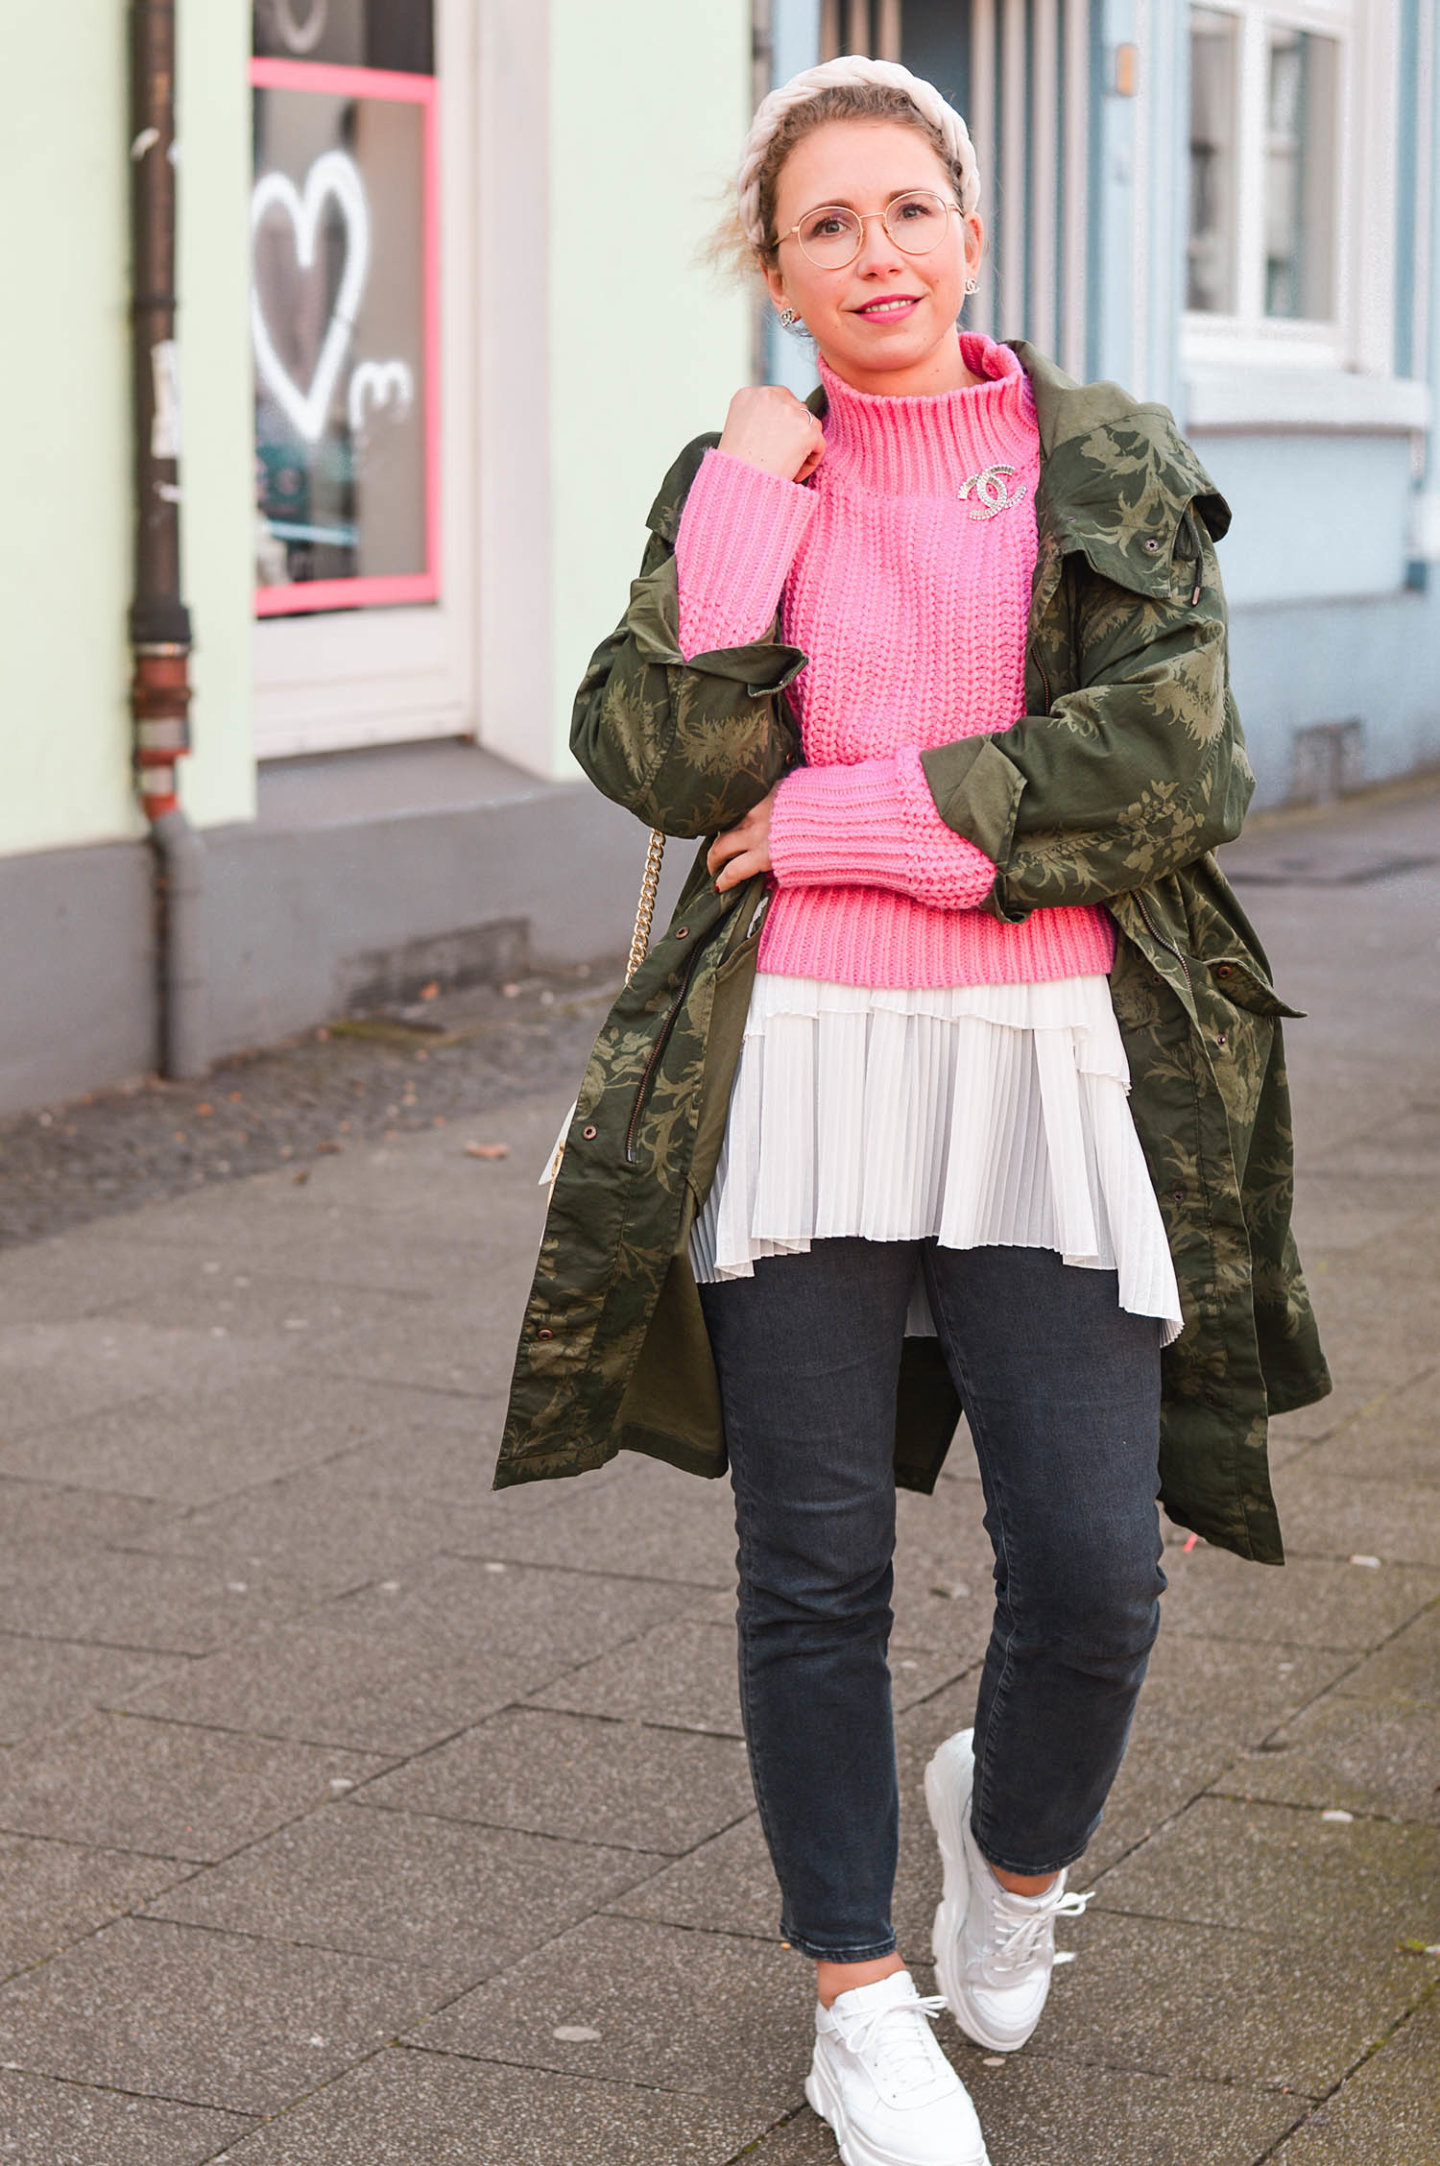 khaki meets pink